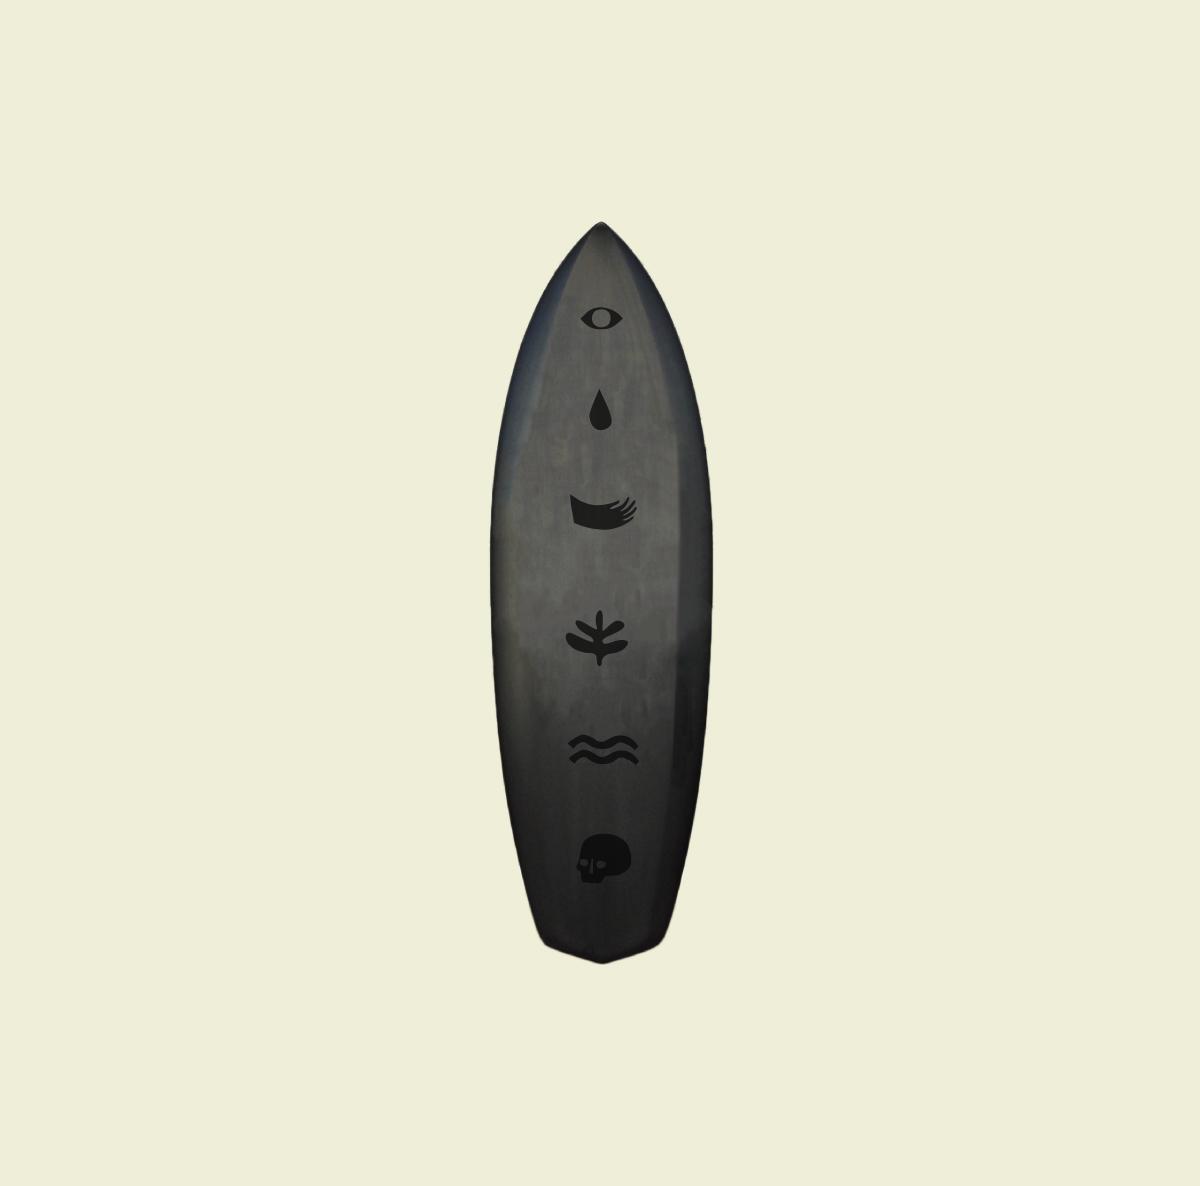 honeyandrust_viscayawagner_surfboard_design.jpg